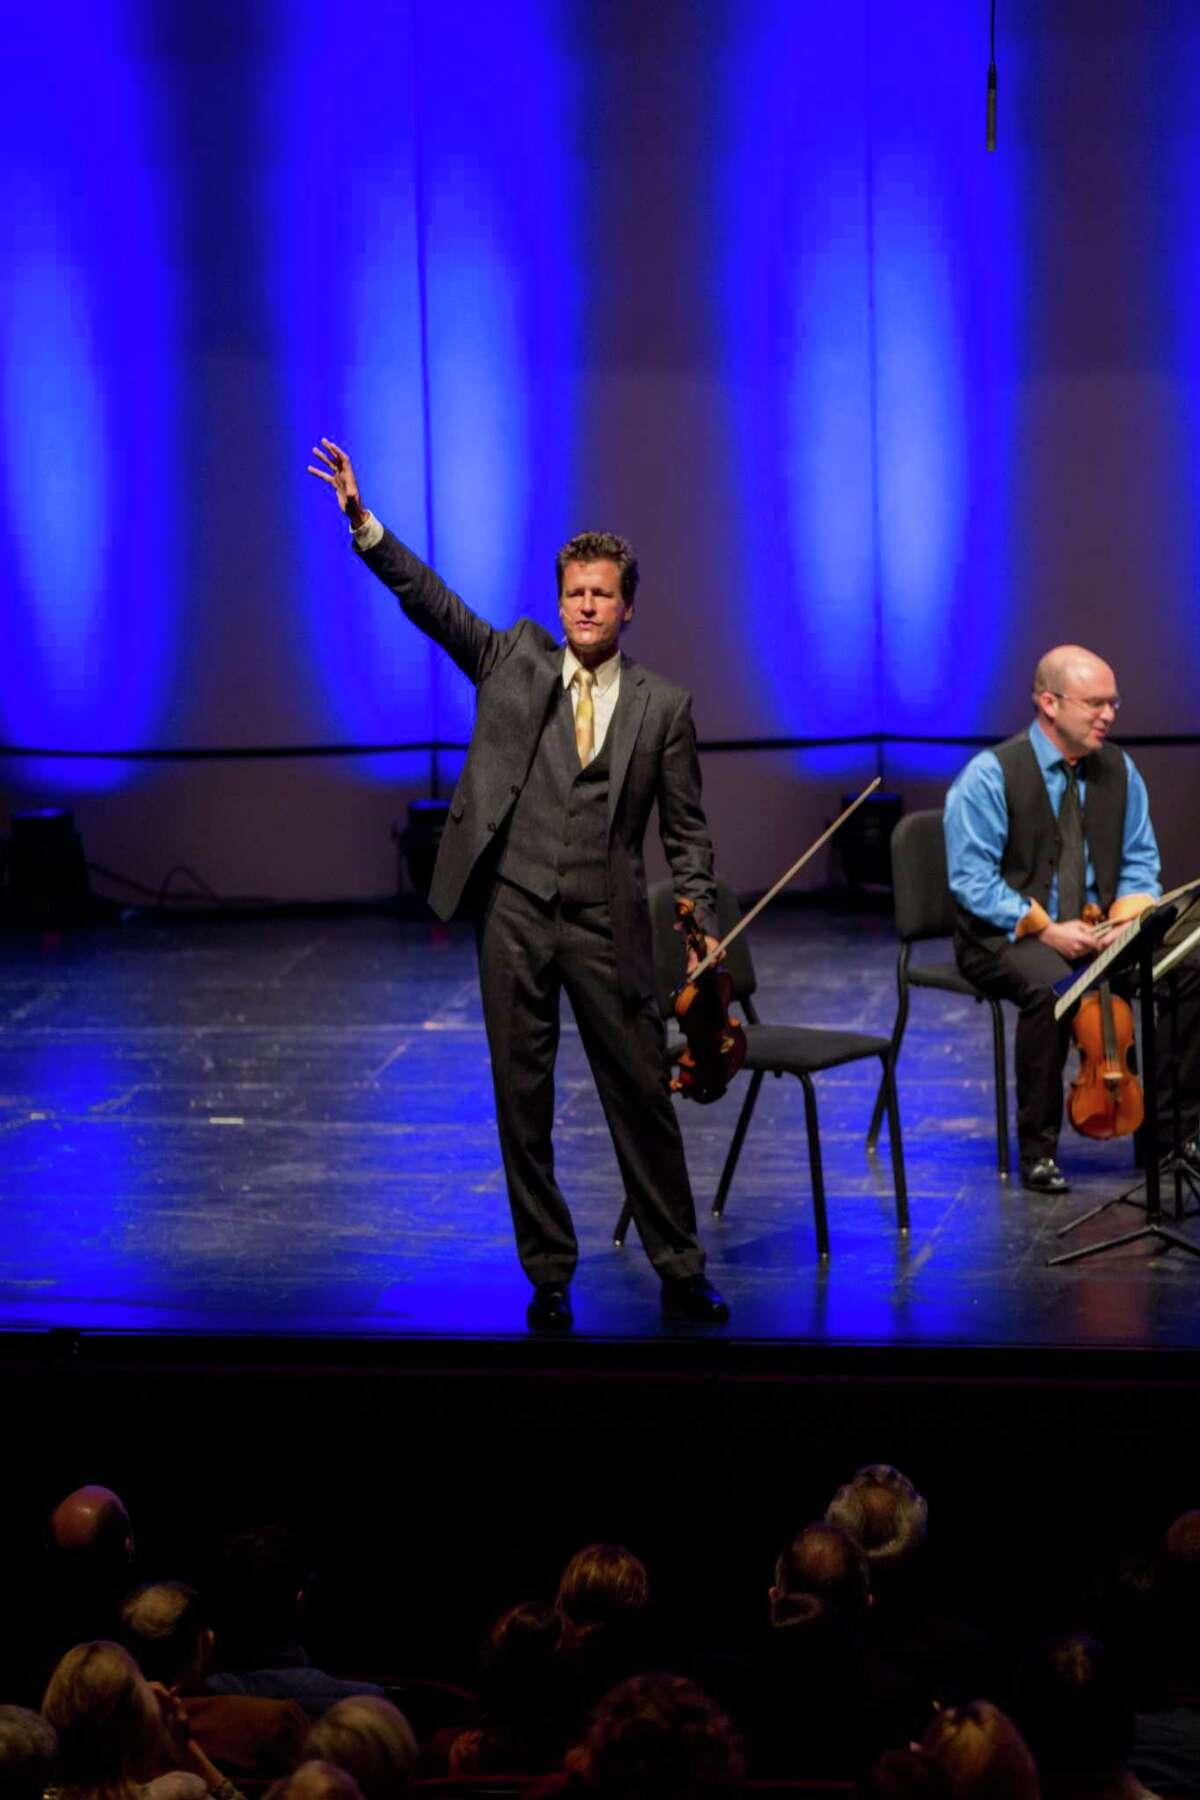 Violinist Geoff Nuttall discusses a Joseph Haydn quartet with Da Camera's audience.